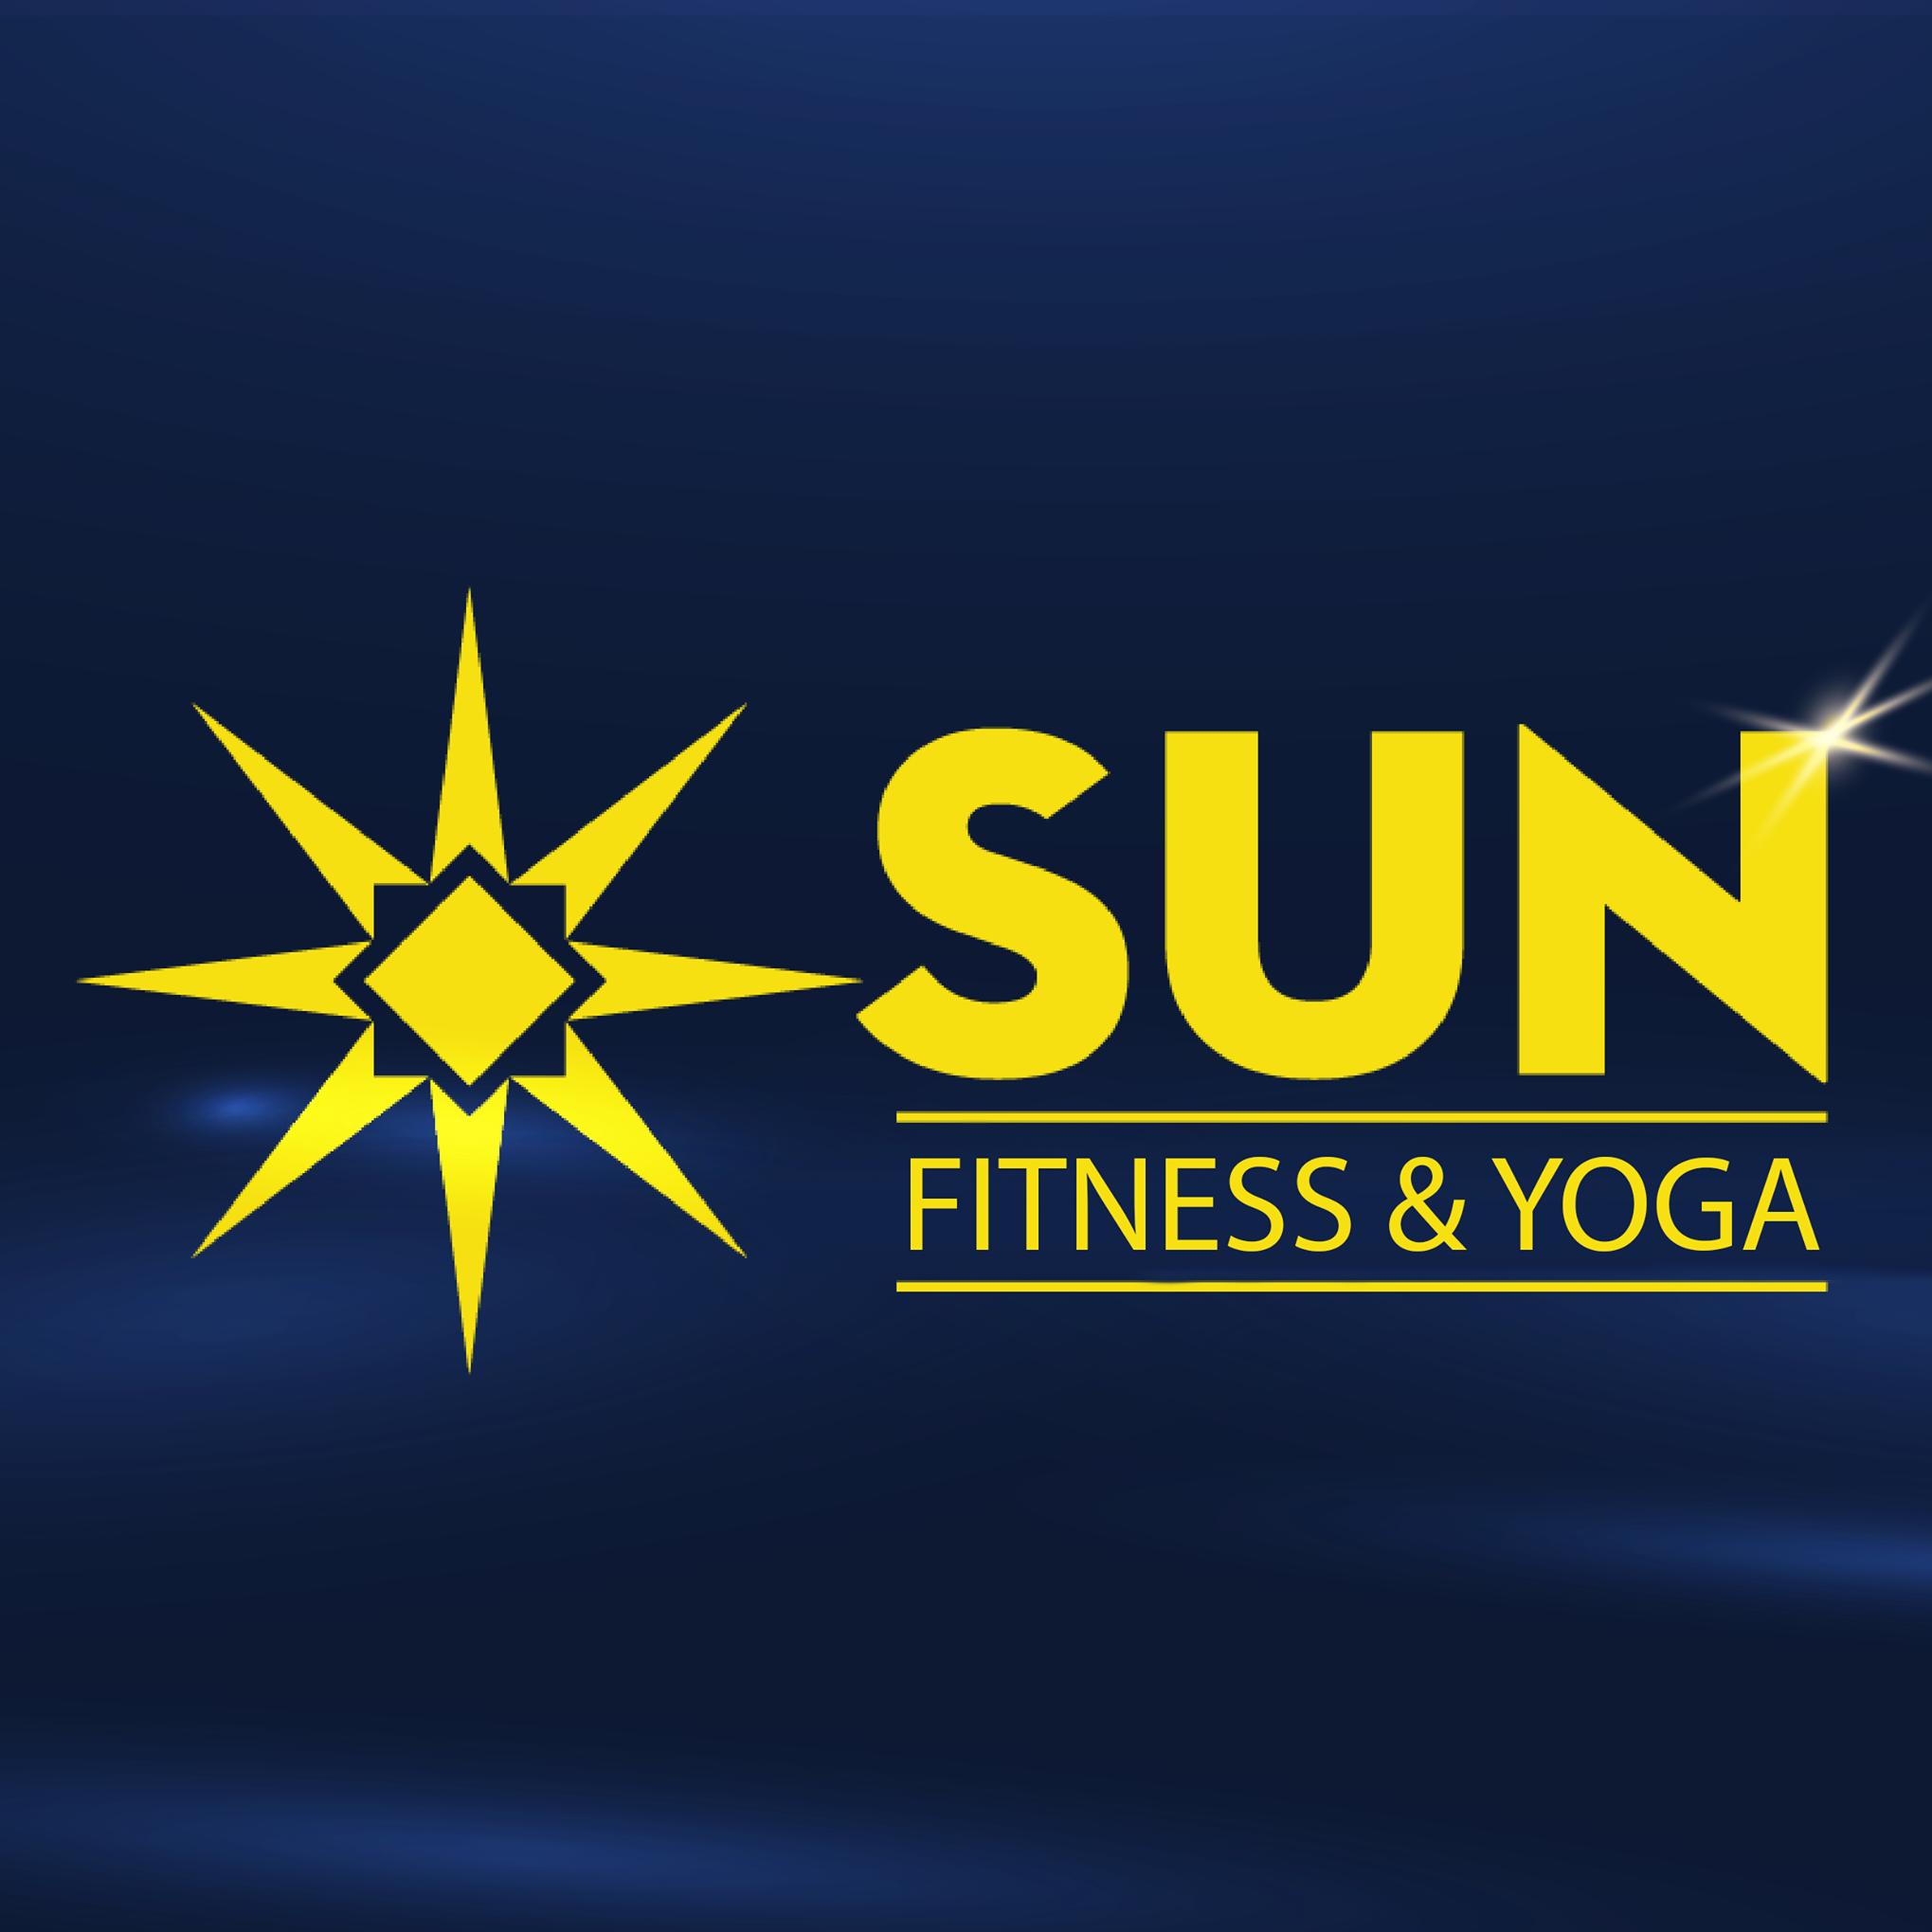 Triển khai phần mềm phòng yoga Gym Master cho Sun Fitness&Yoga Center